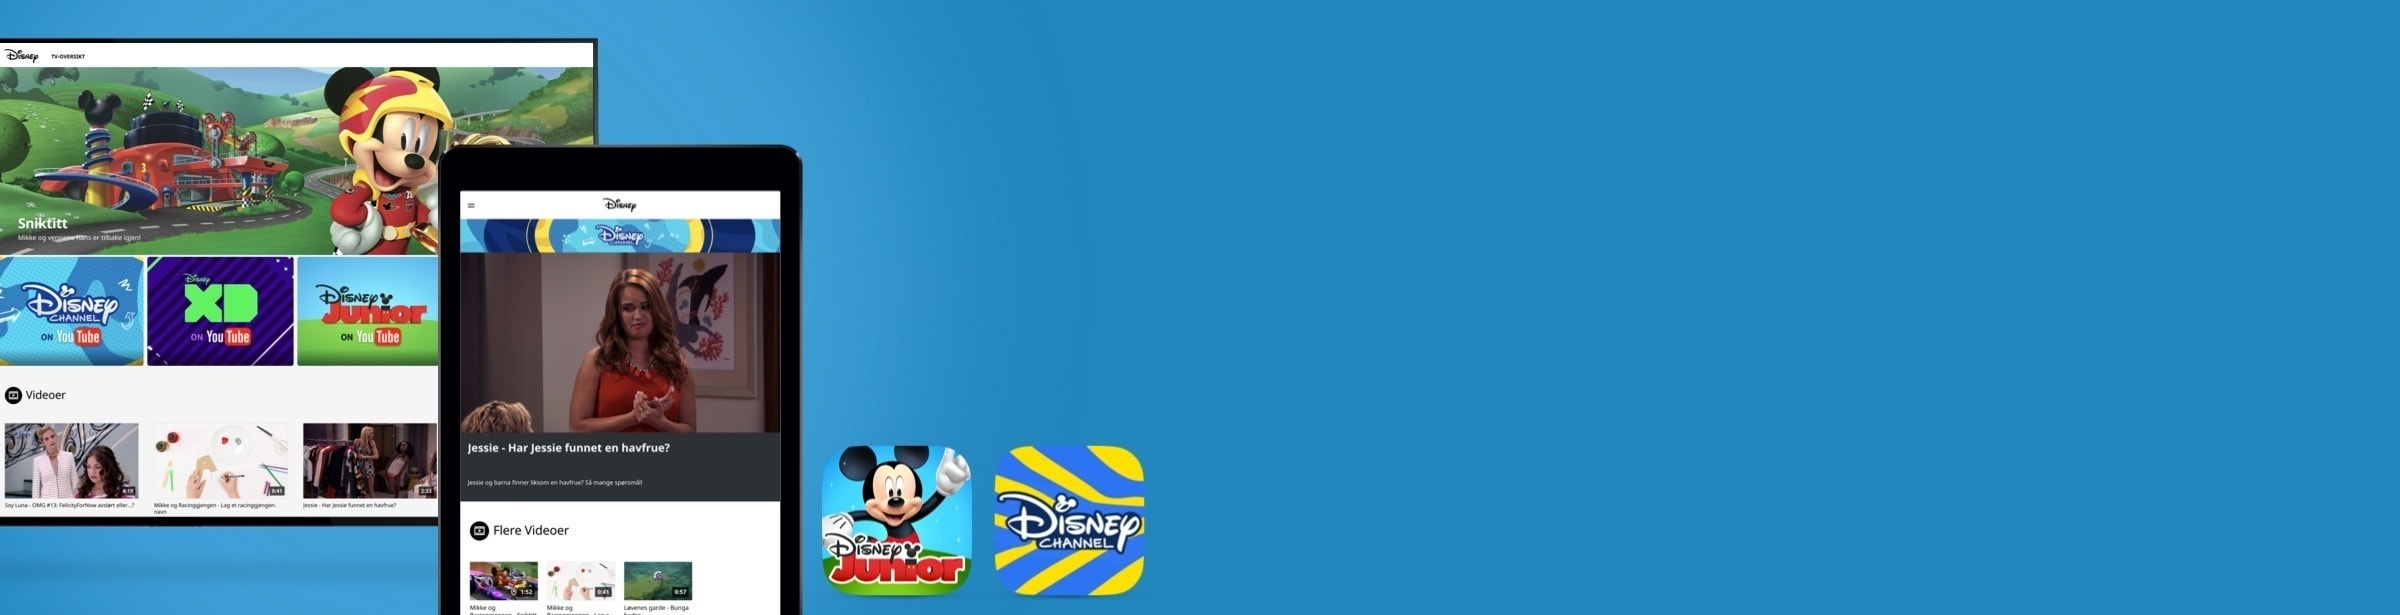 Disney Channel app | Disney Junior app